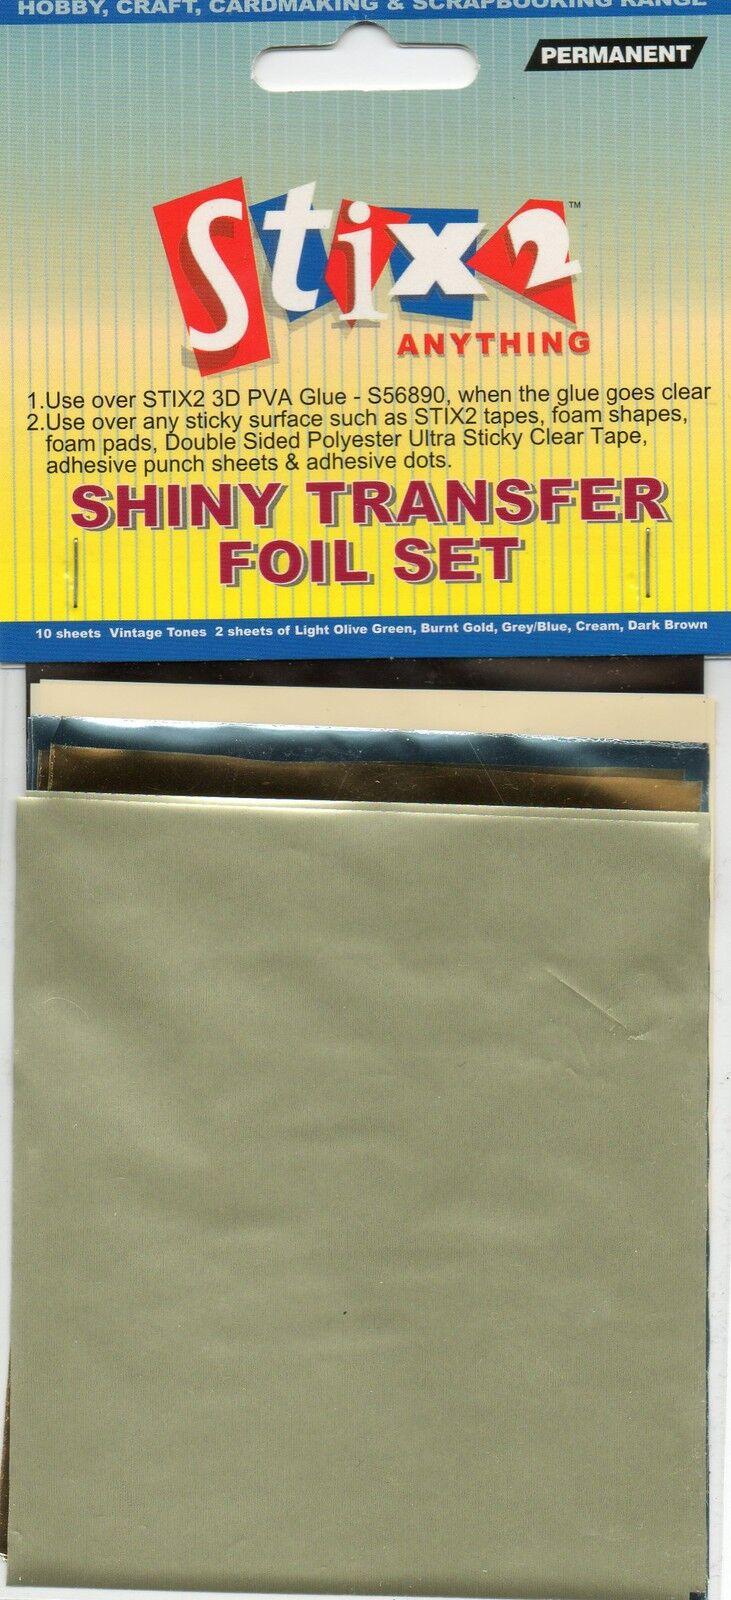 Vintage Tones Hobby Craft Card Making Stix2 Shiny Transfer Foils